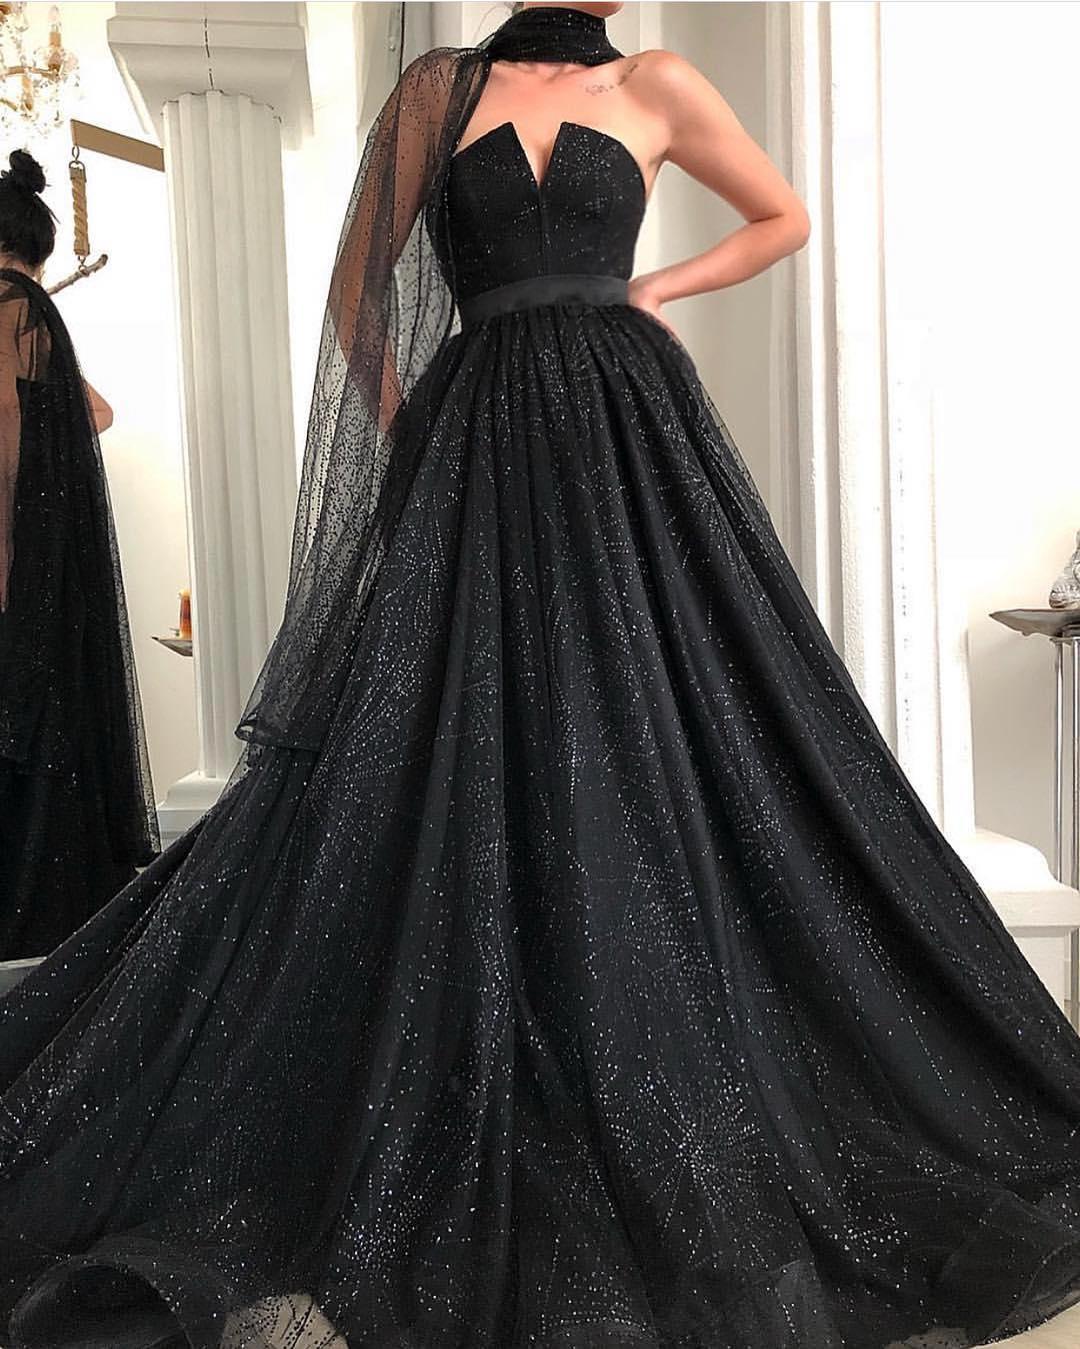 b254296faf0 Black Sparkly Prom Dresses - Gomes Weine AG